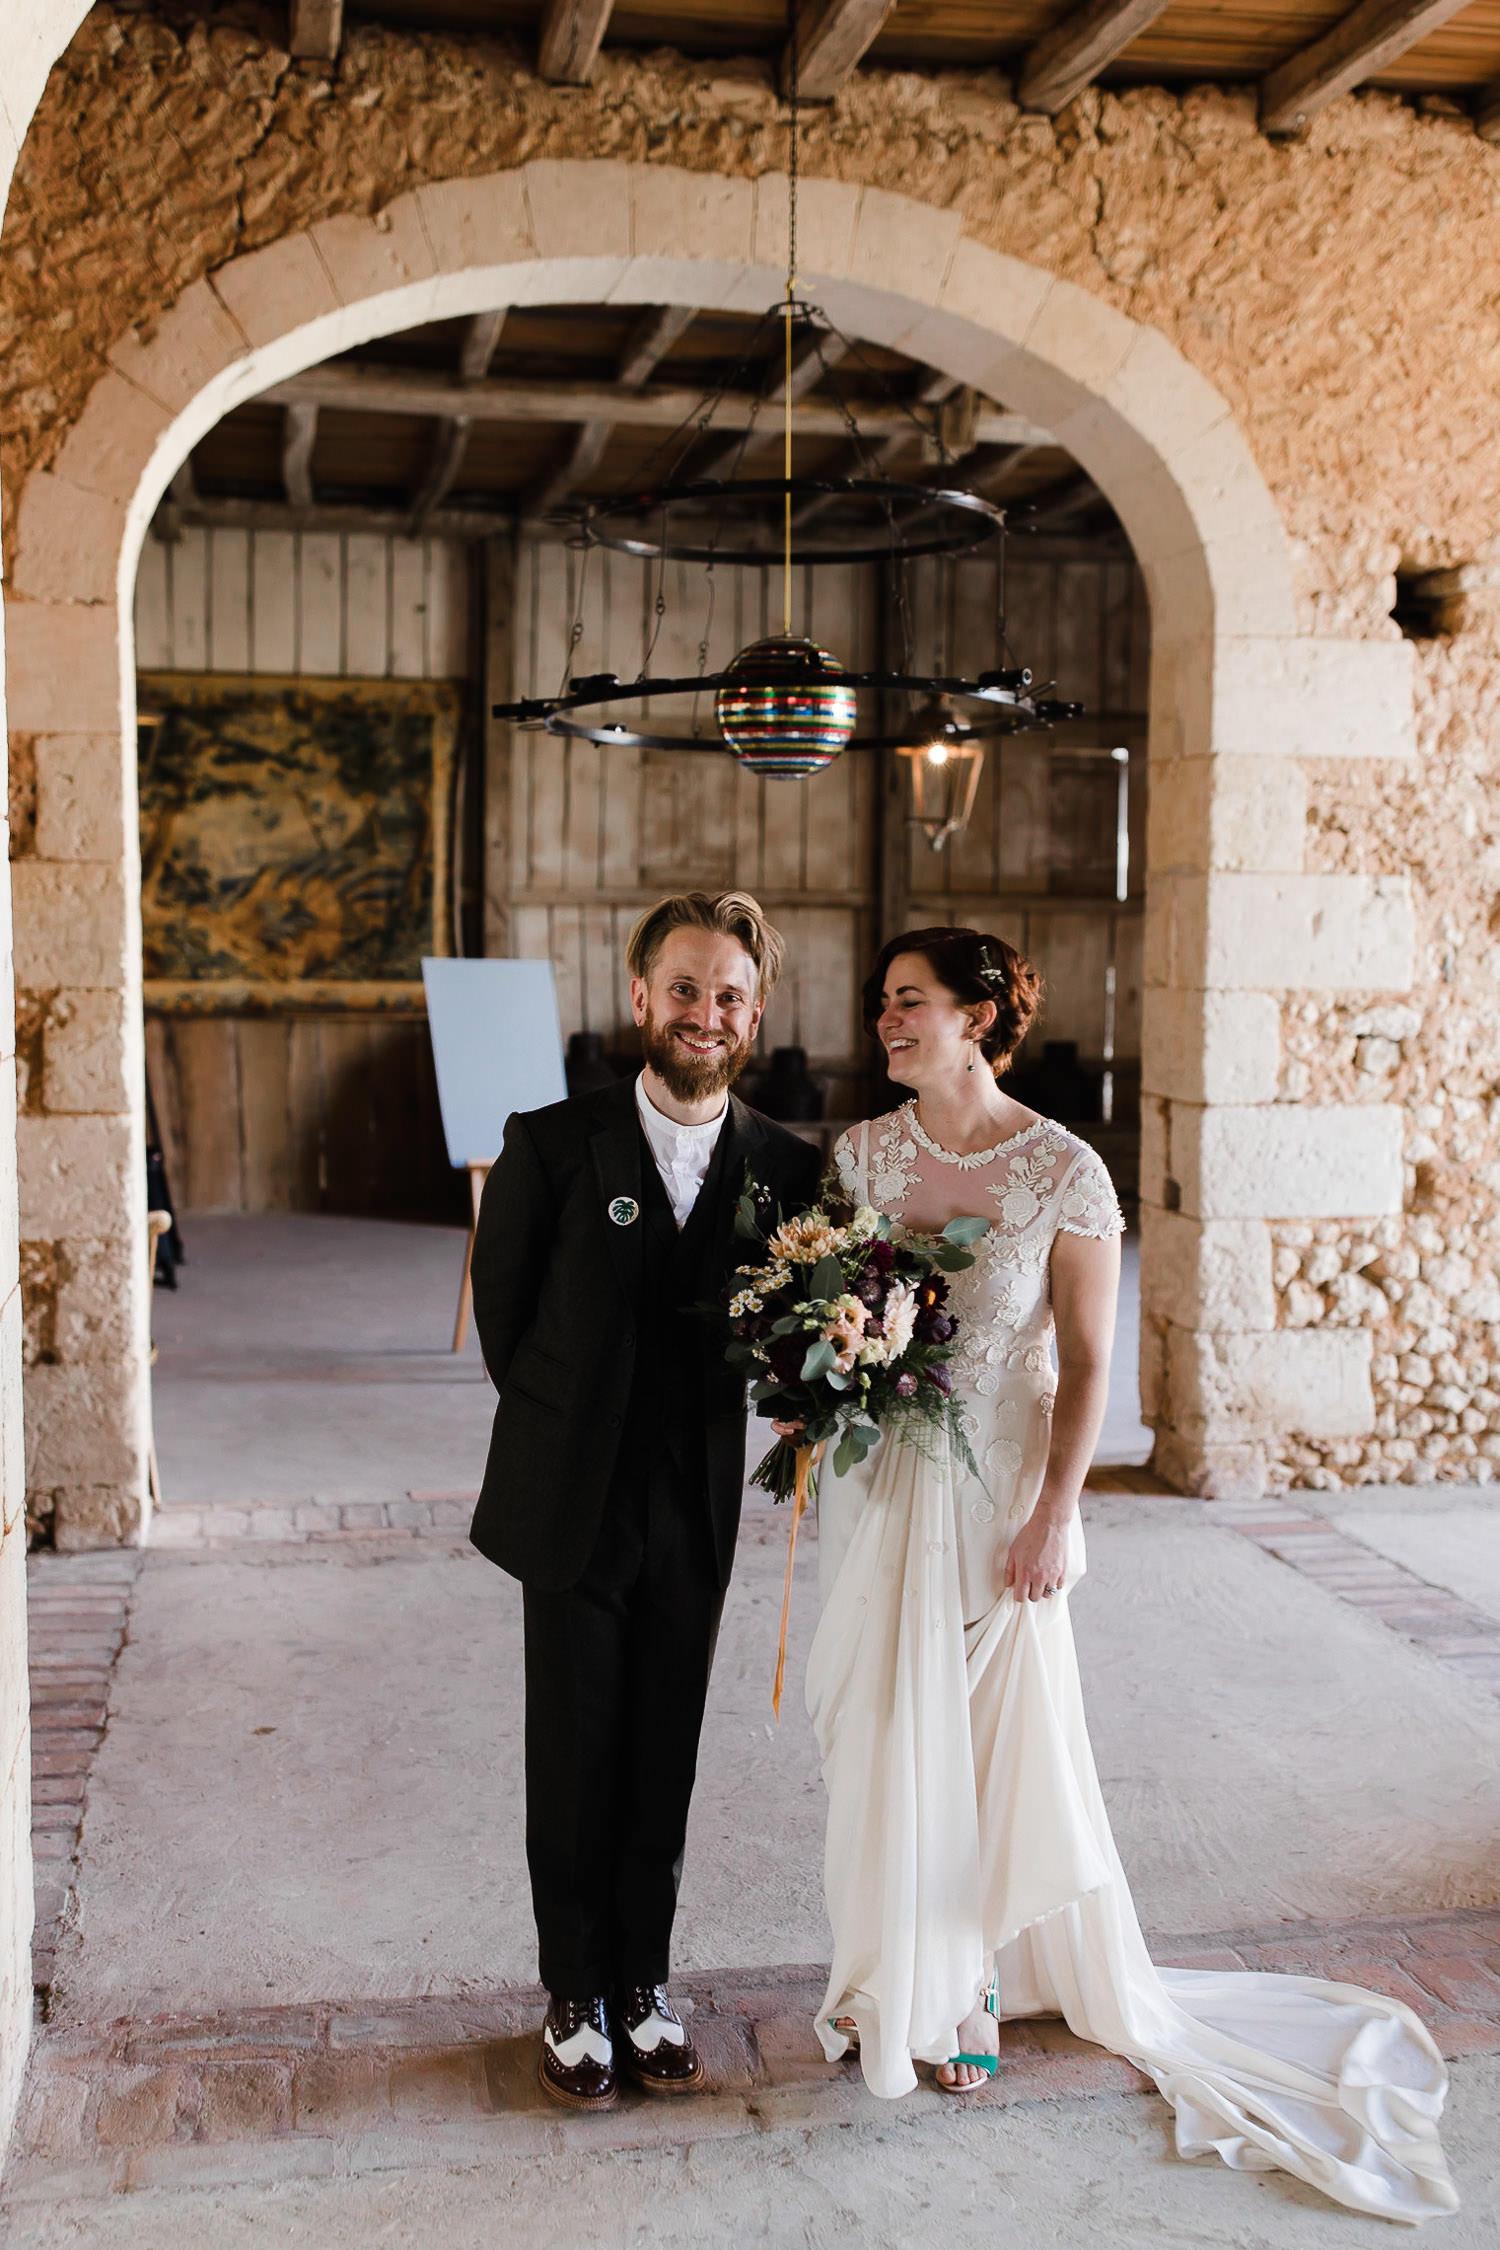 France-Destination-Wedding-Chateau-la-Blérétie-Best-Of-Holly-Jack-93.jpg